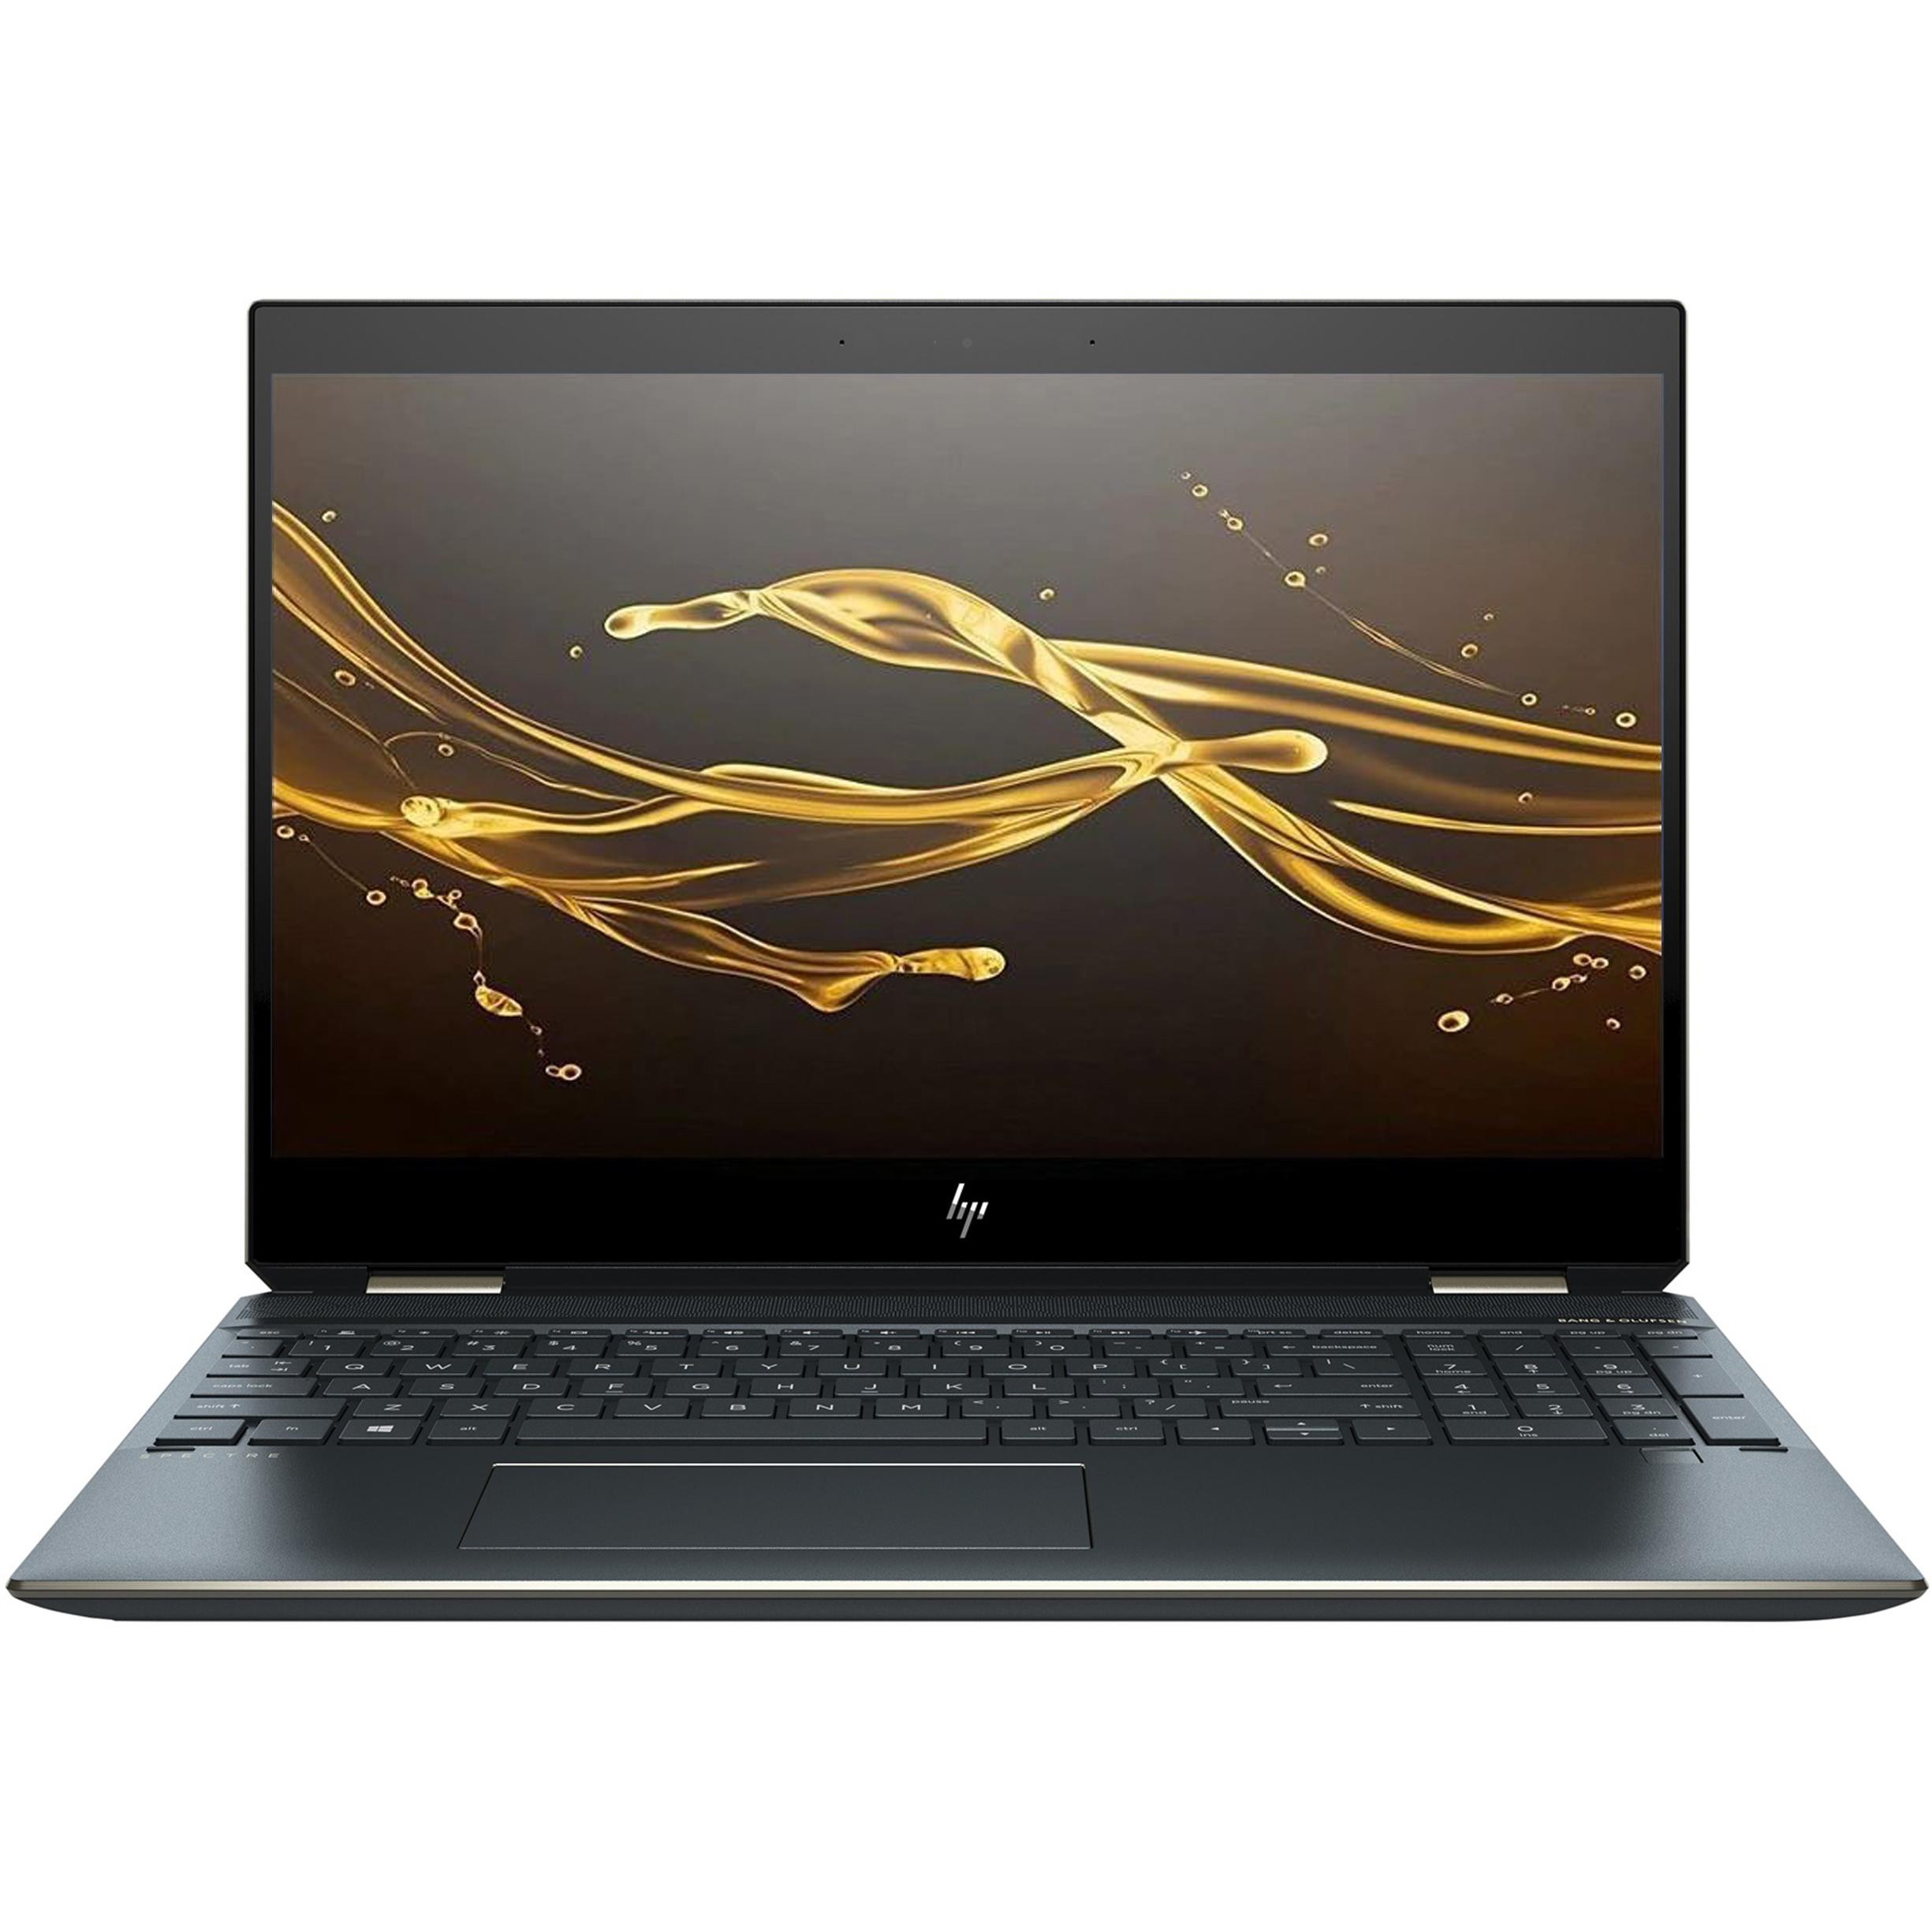 لپ تاپ 15 اینچی اچ پی مدل Spectre x360 15T DF100 G2-B